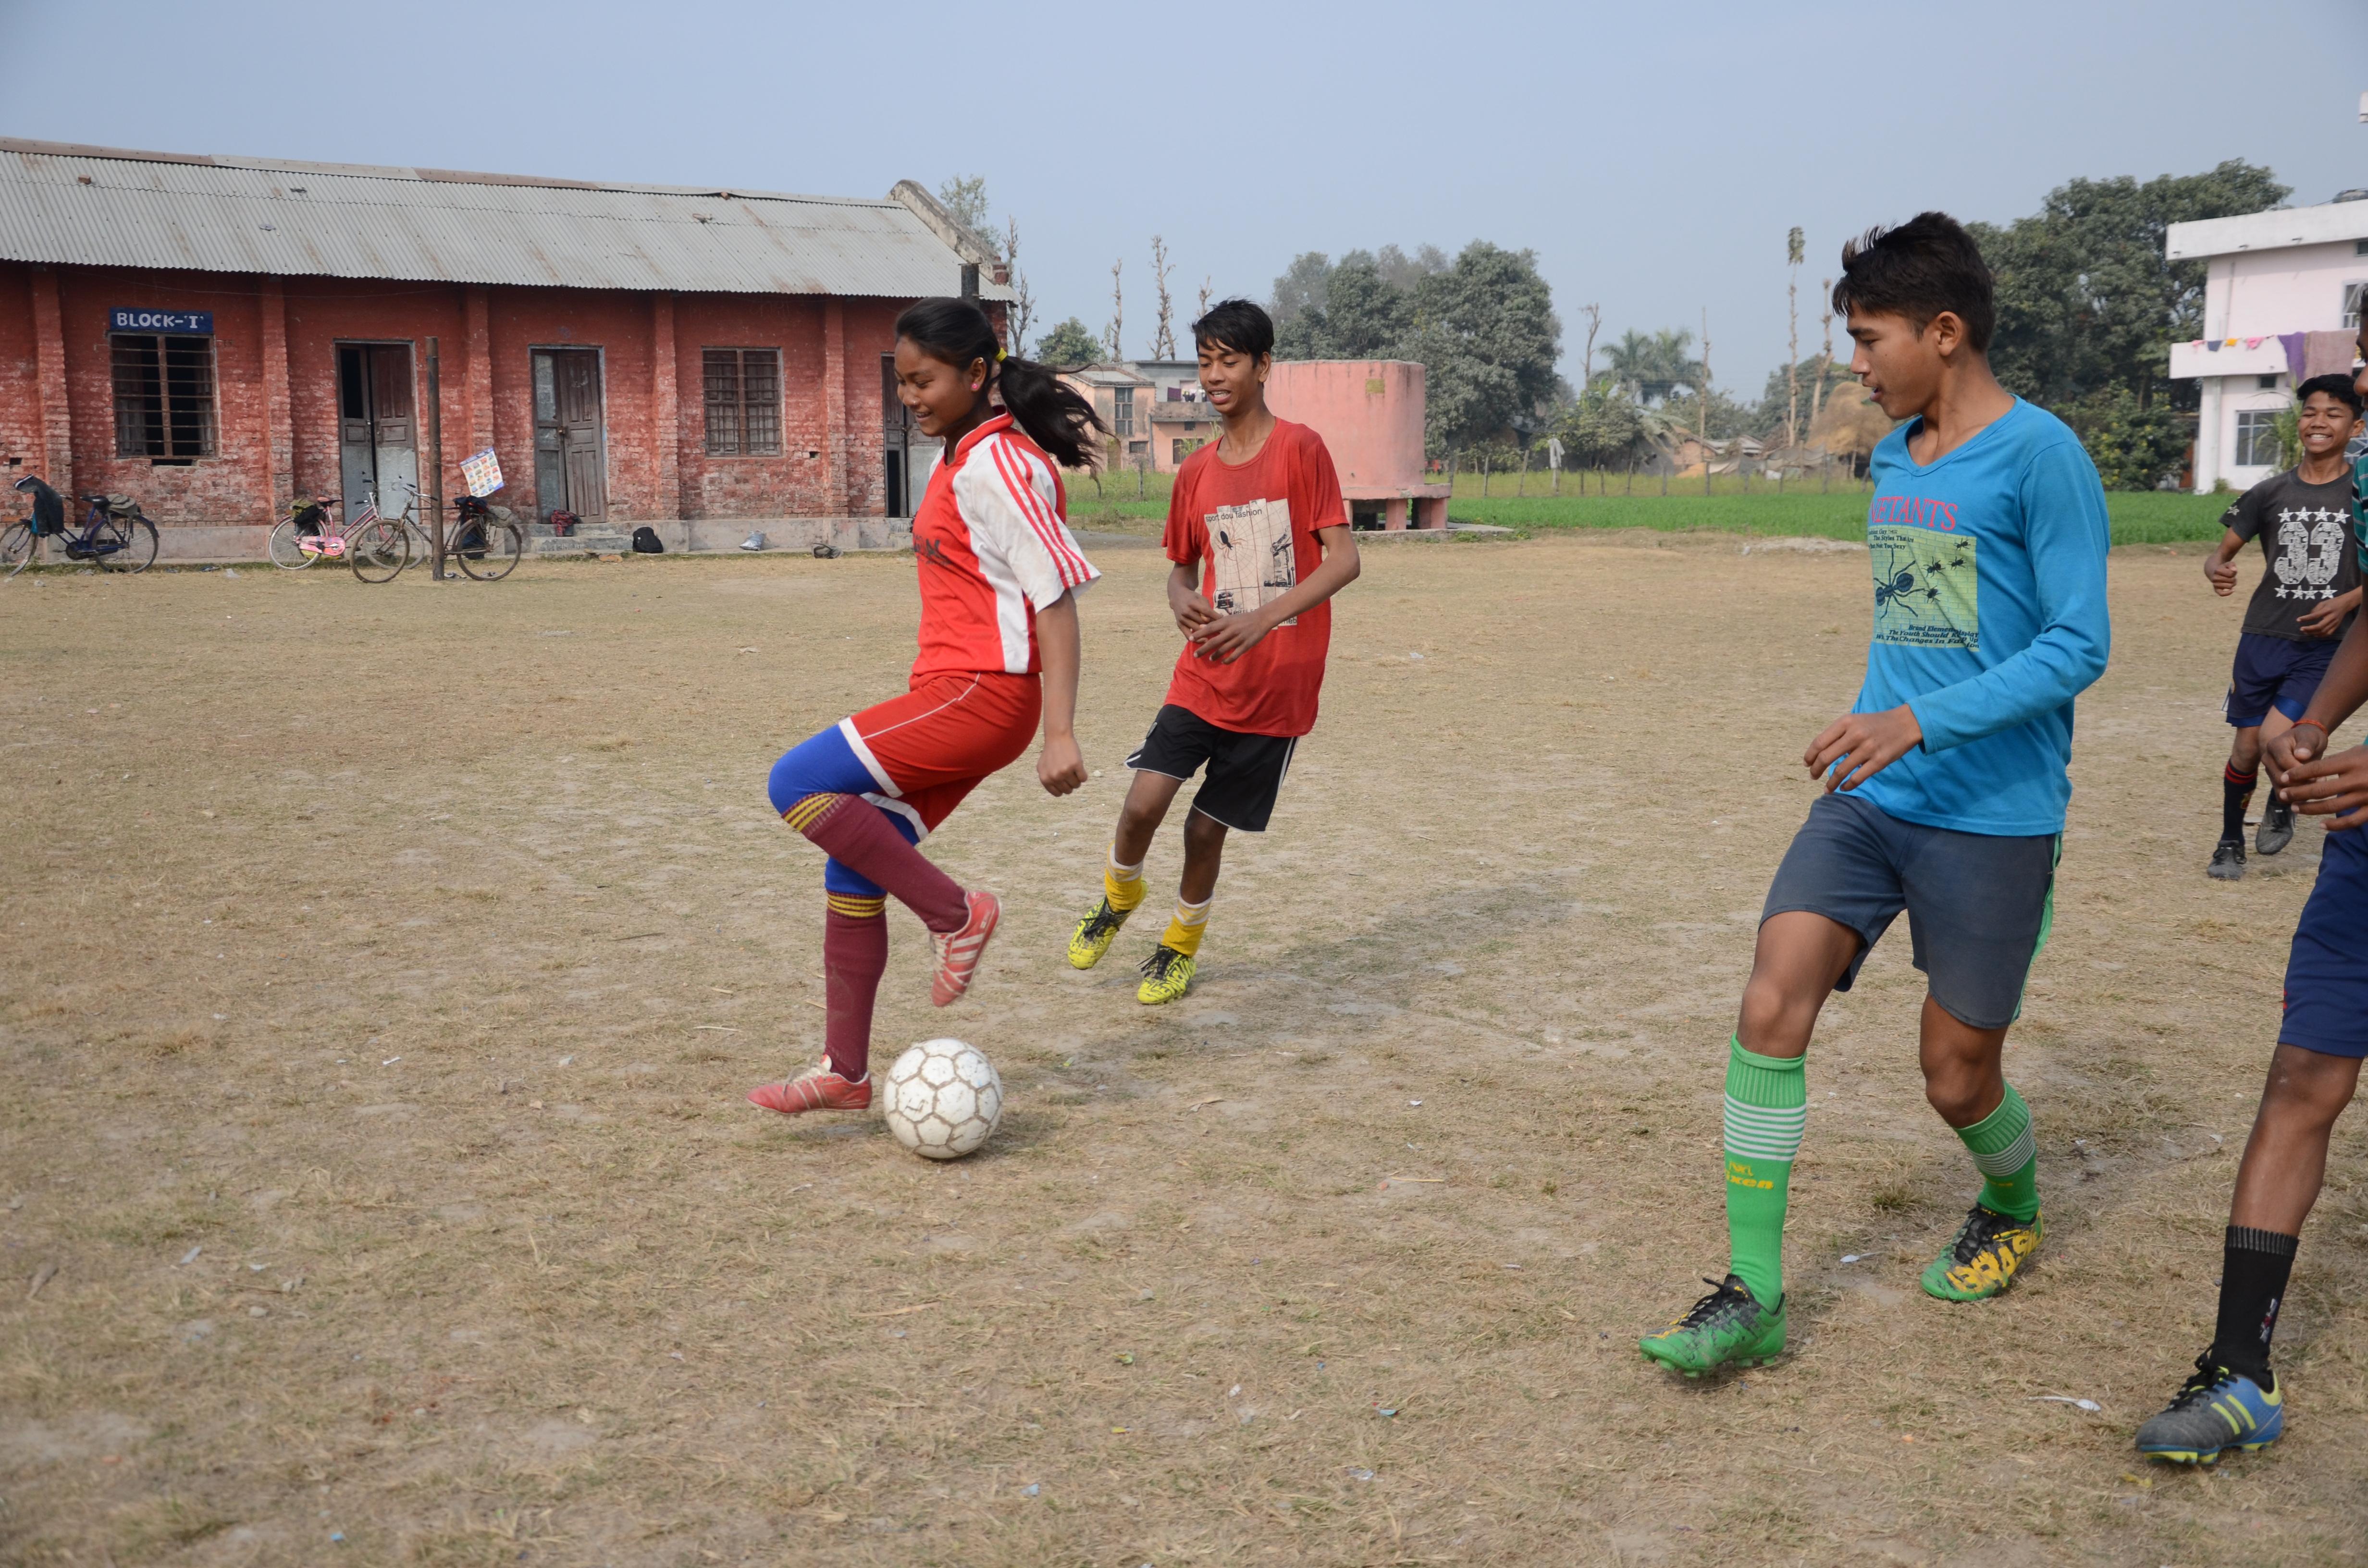 s151194_10_Sumina_Nepal_SKunwar_(18)_720395.JPG